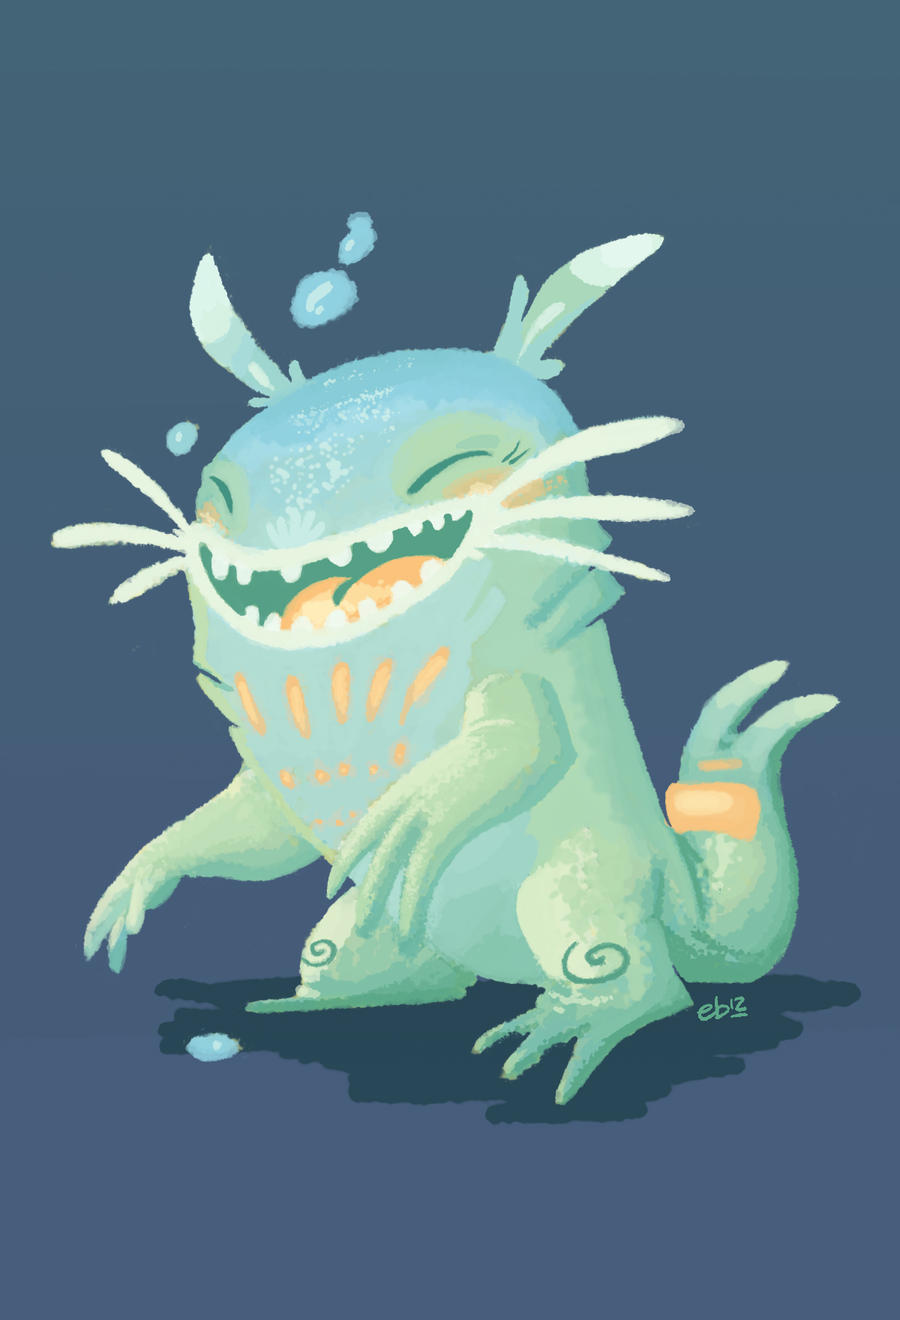 Mr Nostalgia Cute Monster by hooraylorraine